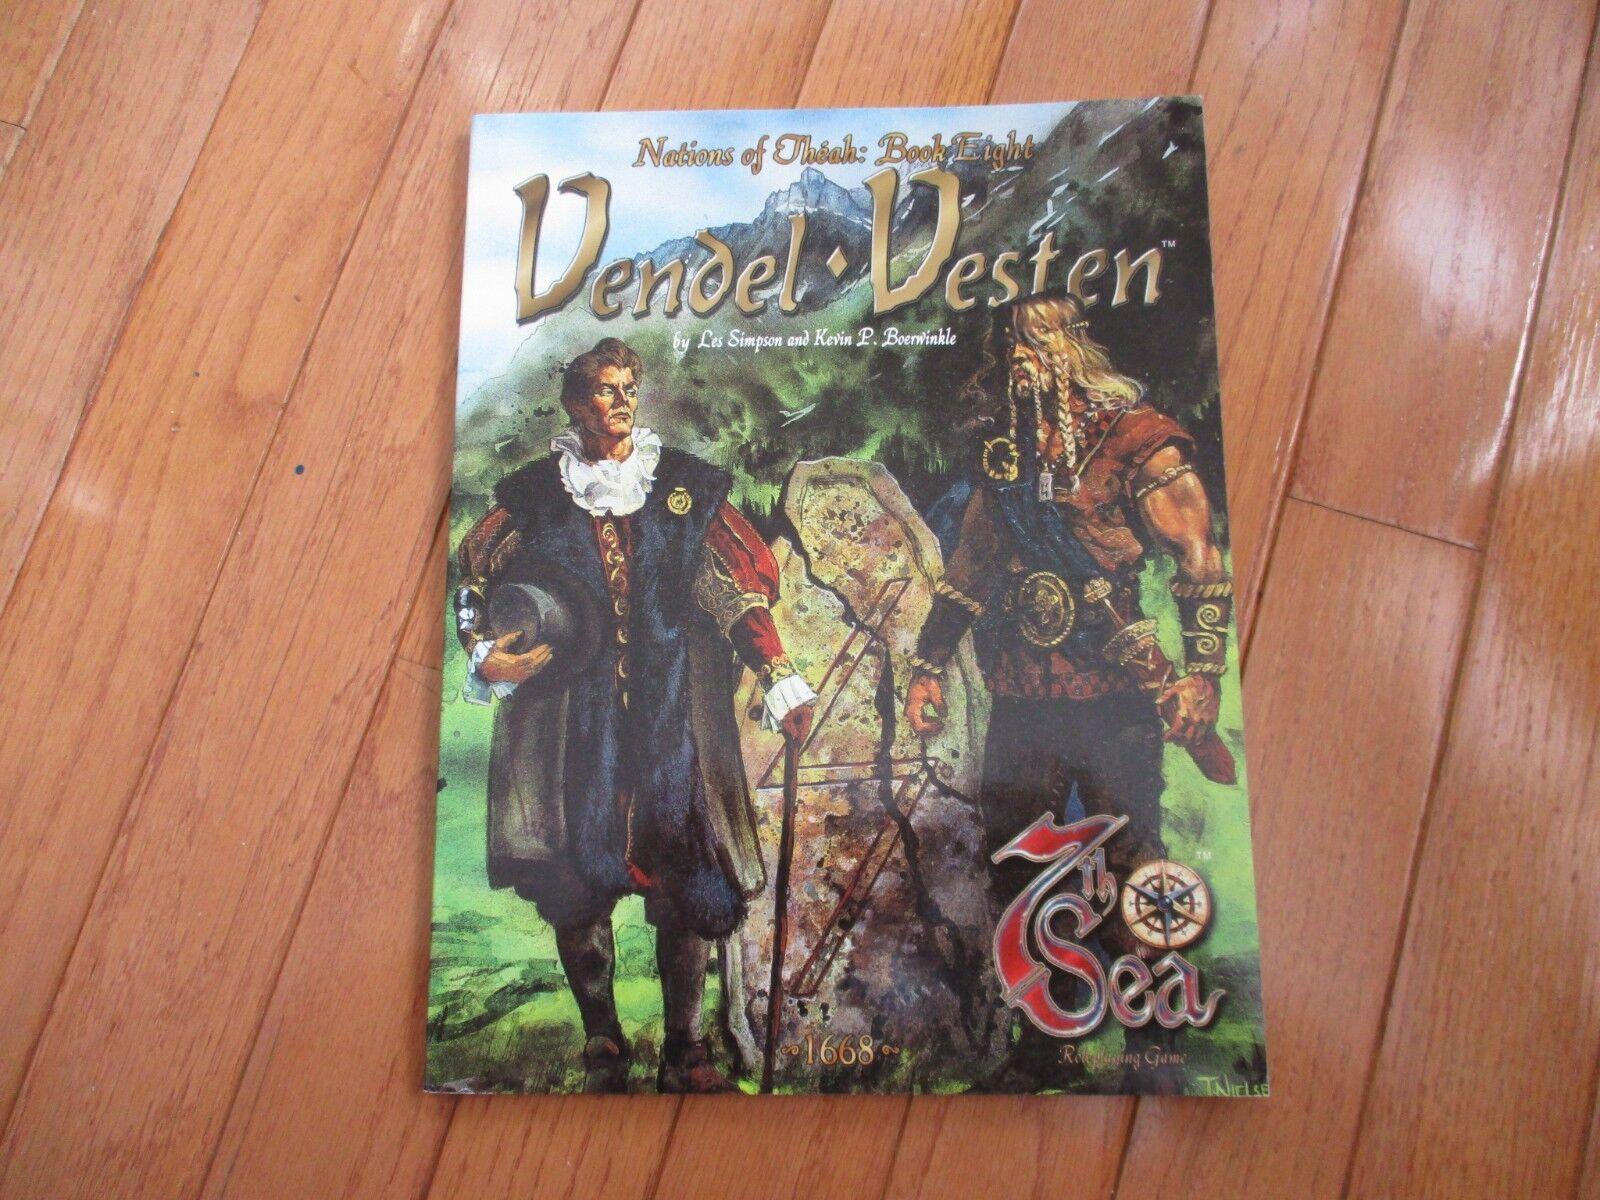 7th Sea RPG Nations of Theah Book 8 Vendel Vesten NM